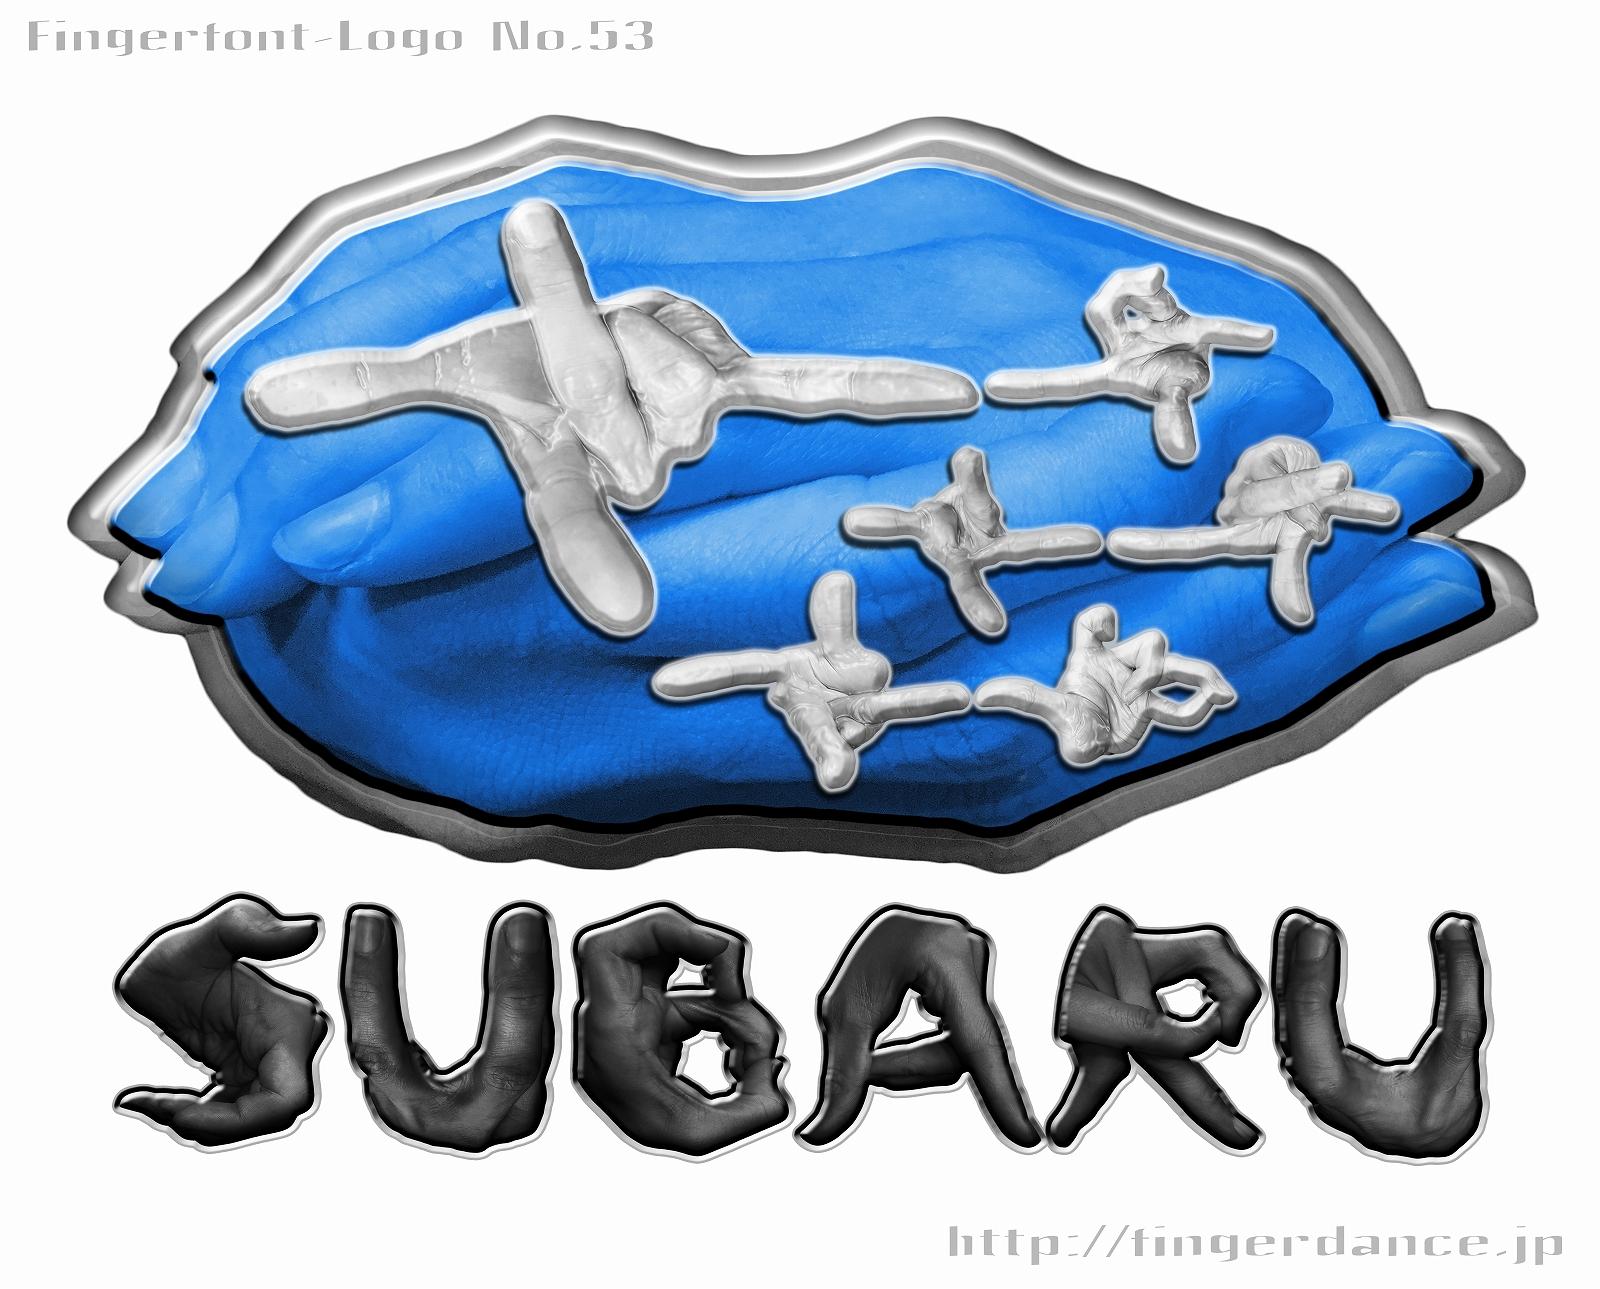 SUBARU-fingerhttp://fingerdance.jp/L/logohand スバル富士重工業フィンガーロゴハンド手指